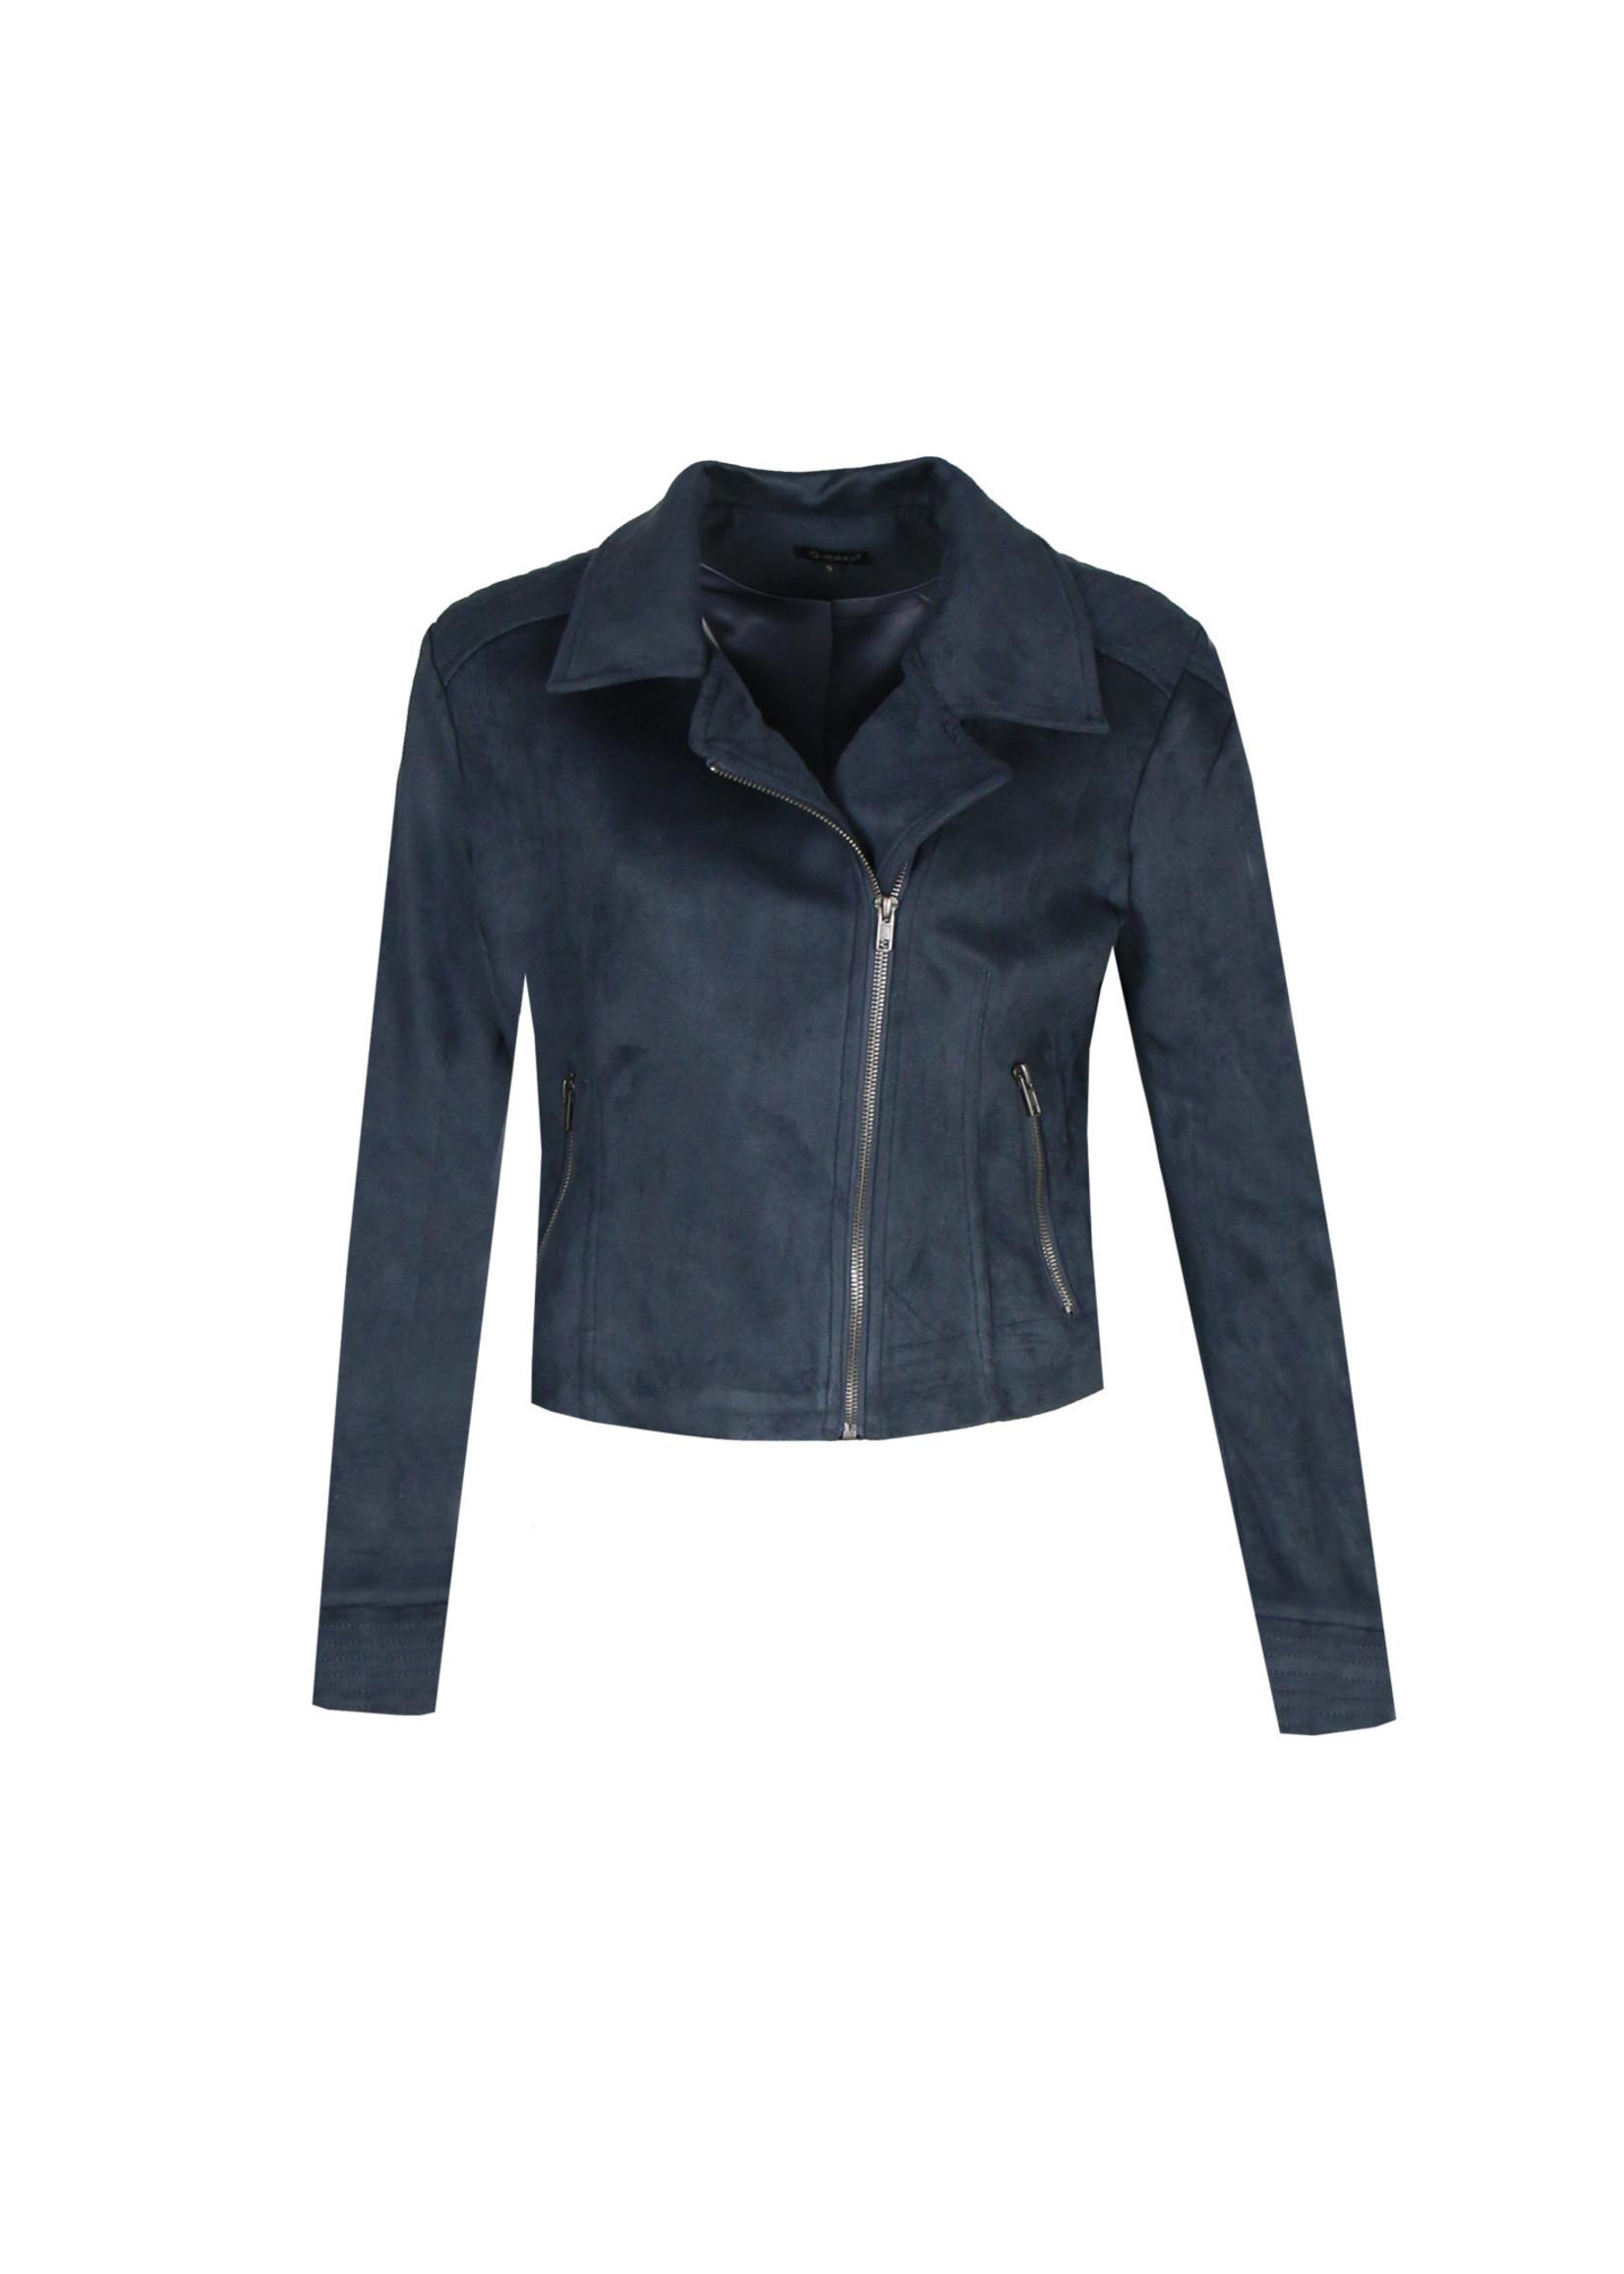 G-Maxx G-maxx - Annelies jacket - jeansblauw